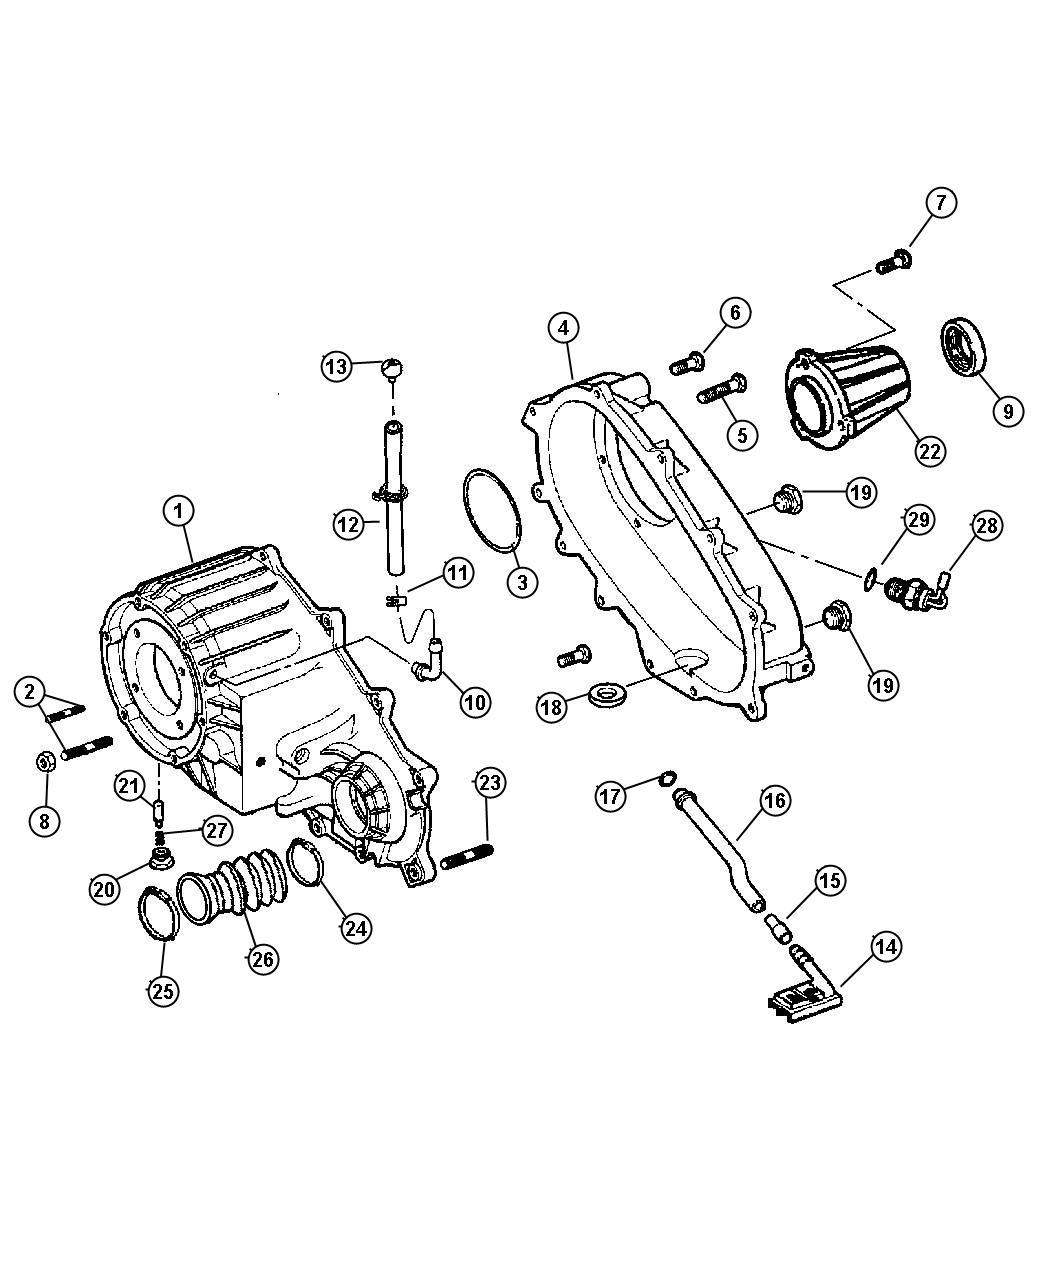 Audiotronics 210 Manual Transfer